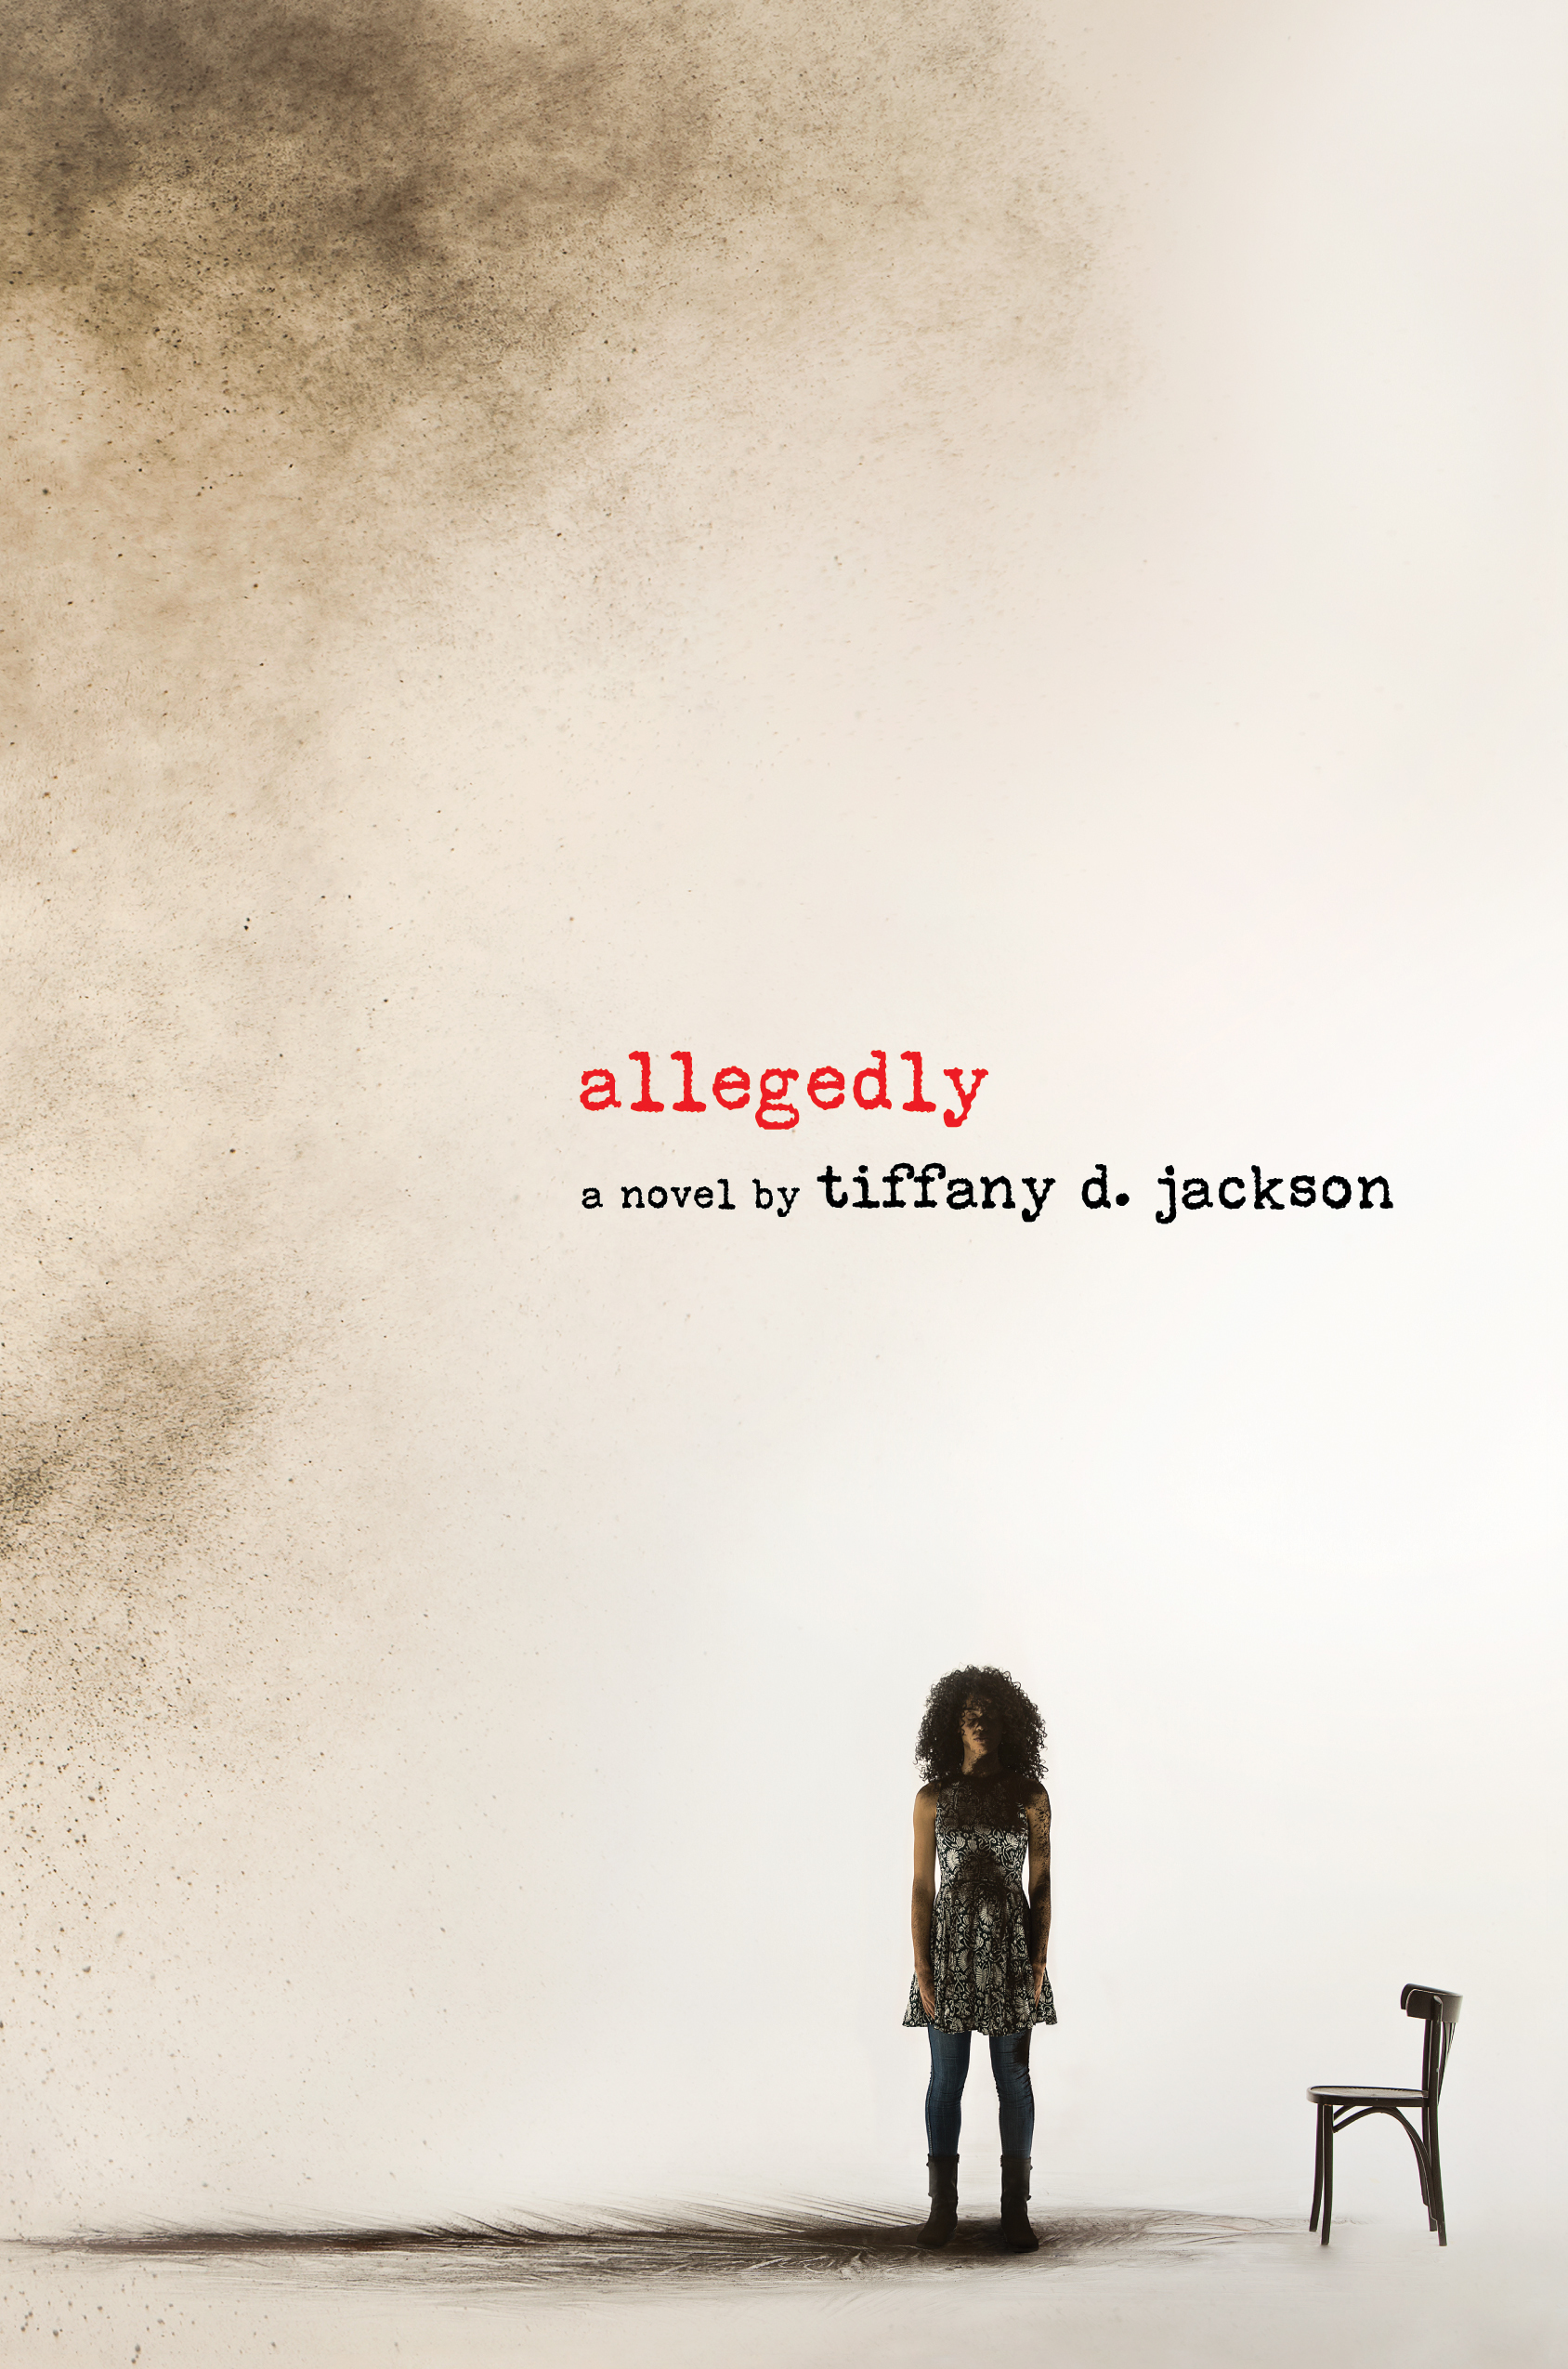 Tiffany D Jackson - Allegedly